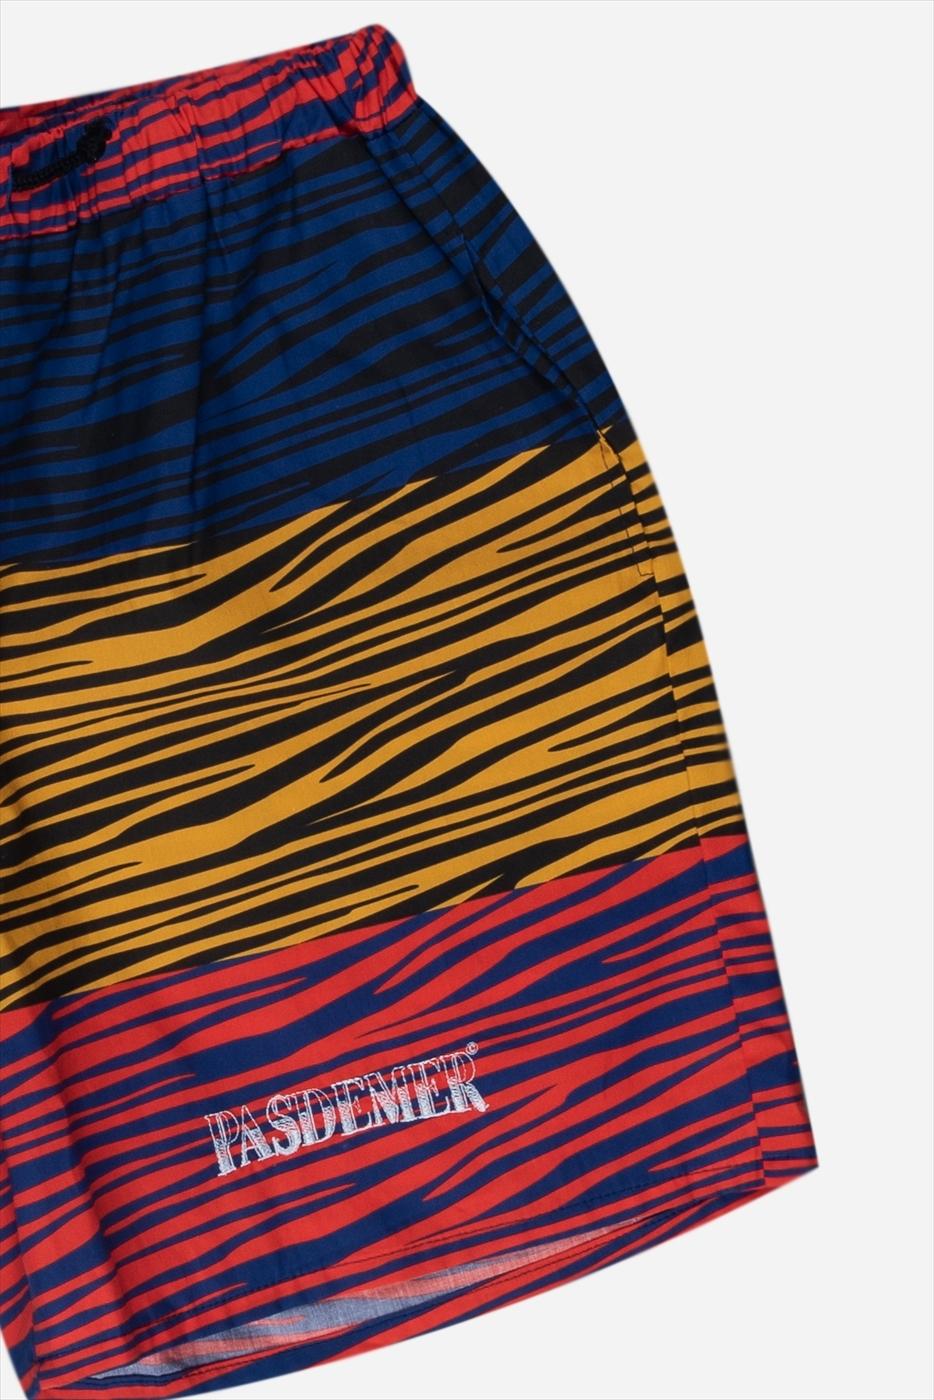 【PAS DE MER/パドゥメ】TIGER SHORTS  ショートパンツ / YELLOW/RED/BLUE PATTERN